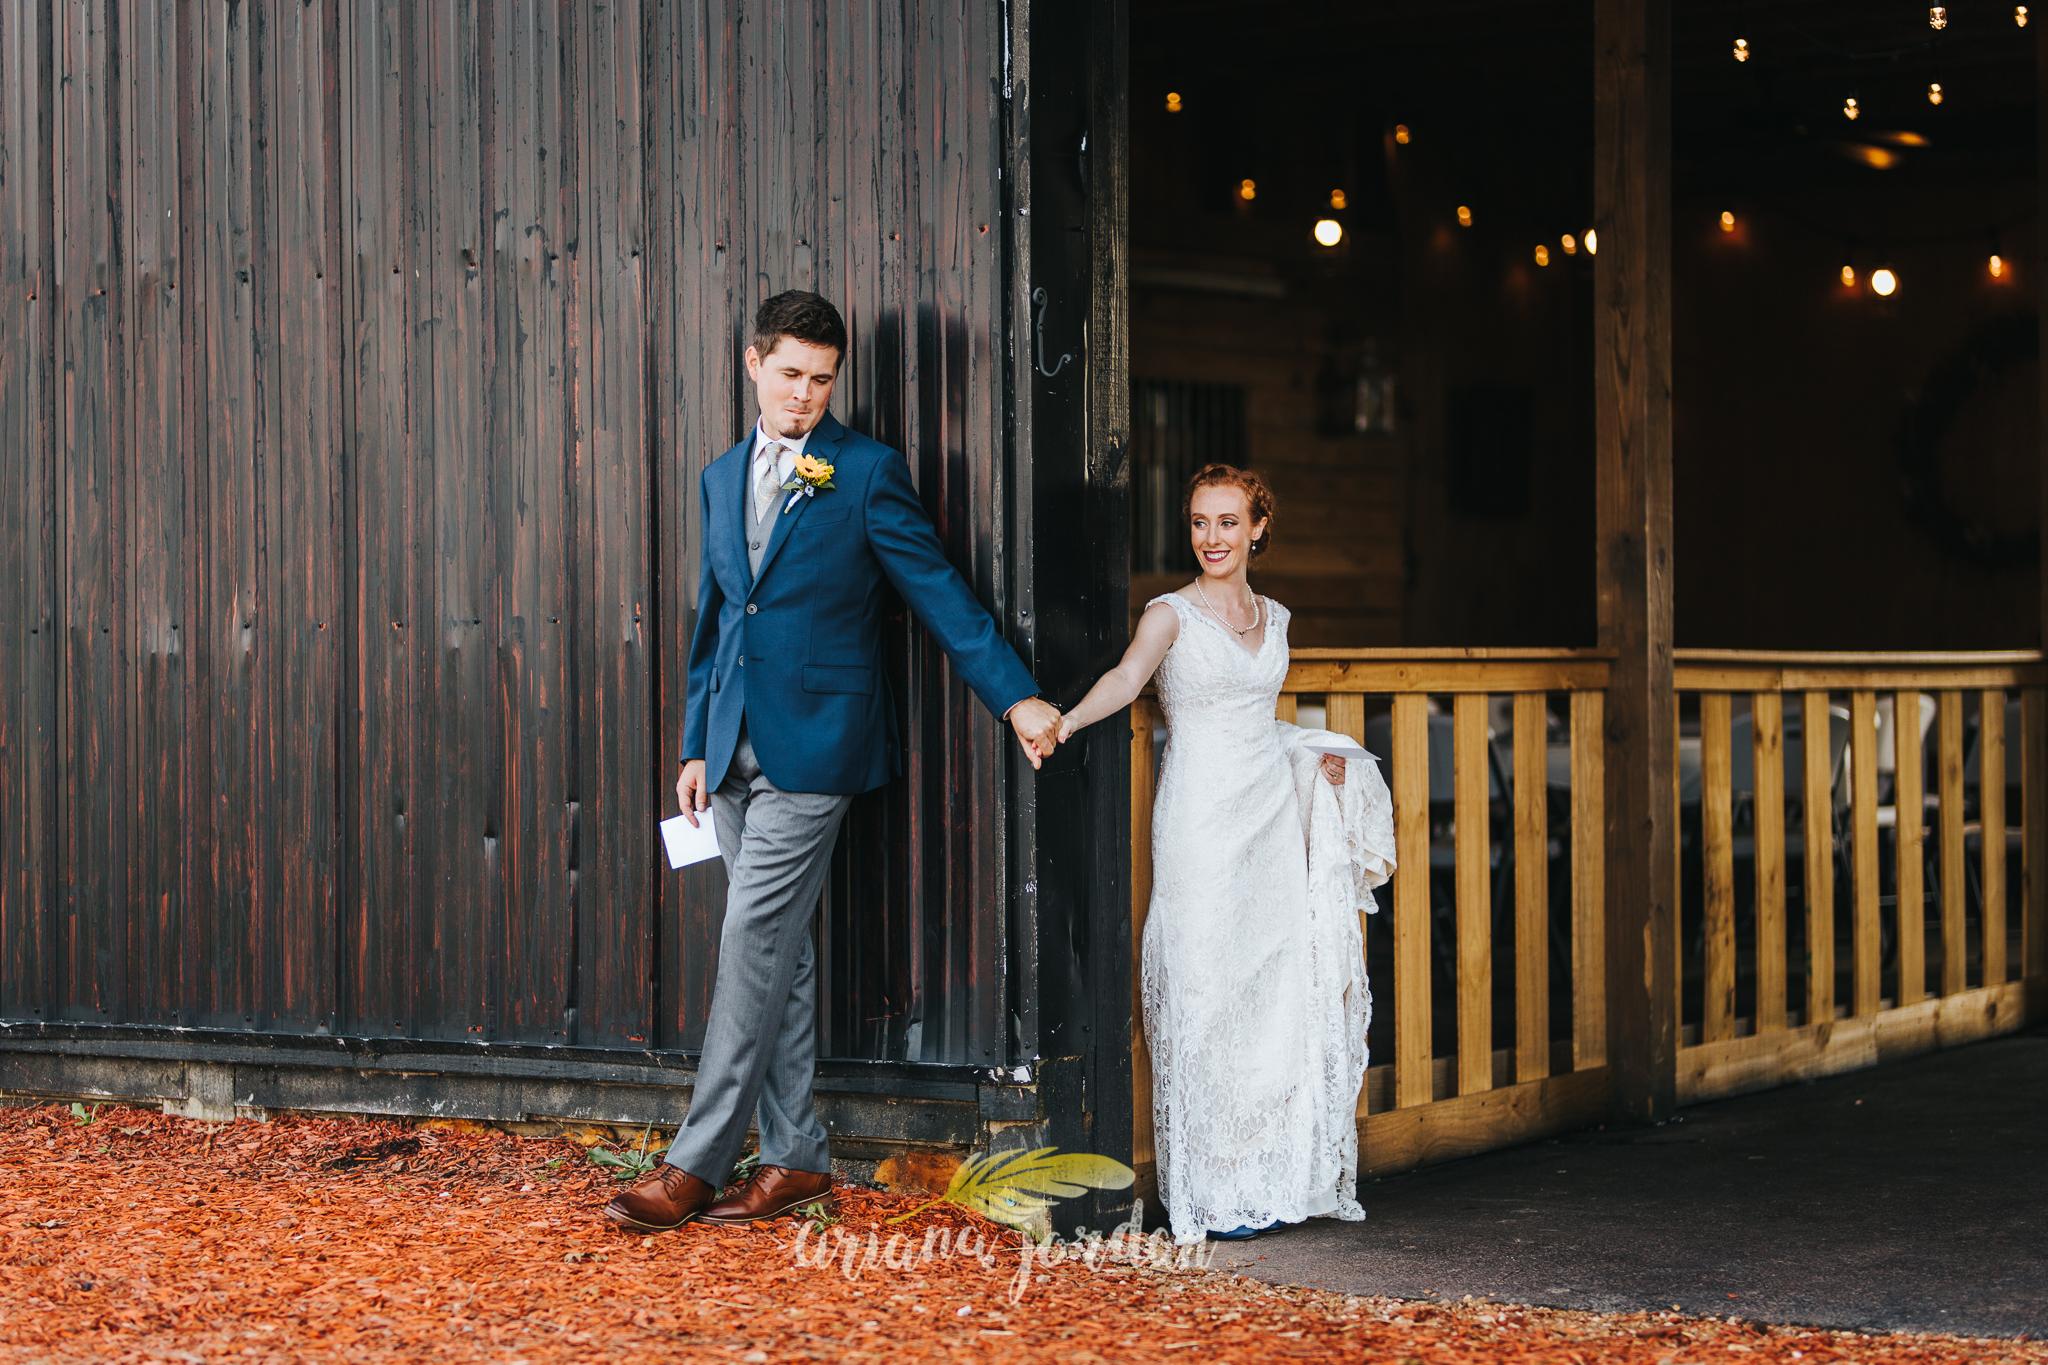 047 Ariana Jordan Photography -Moonlight Fields Lexington Ky Wedding Photographer 4326.jpg